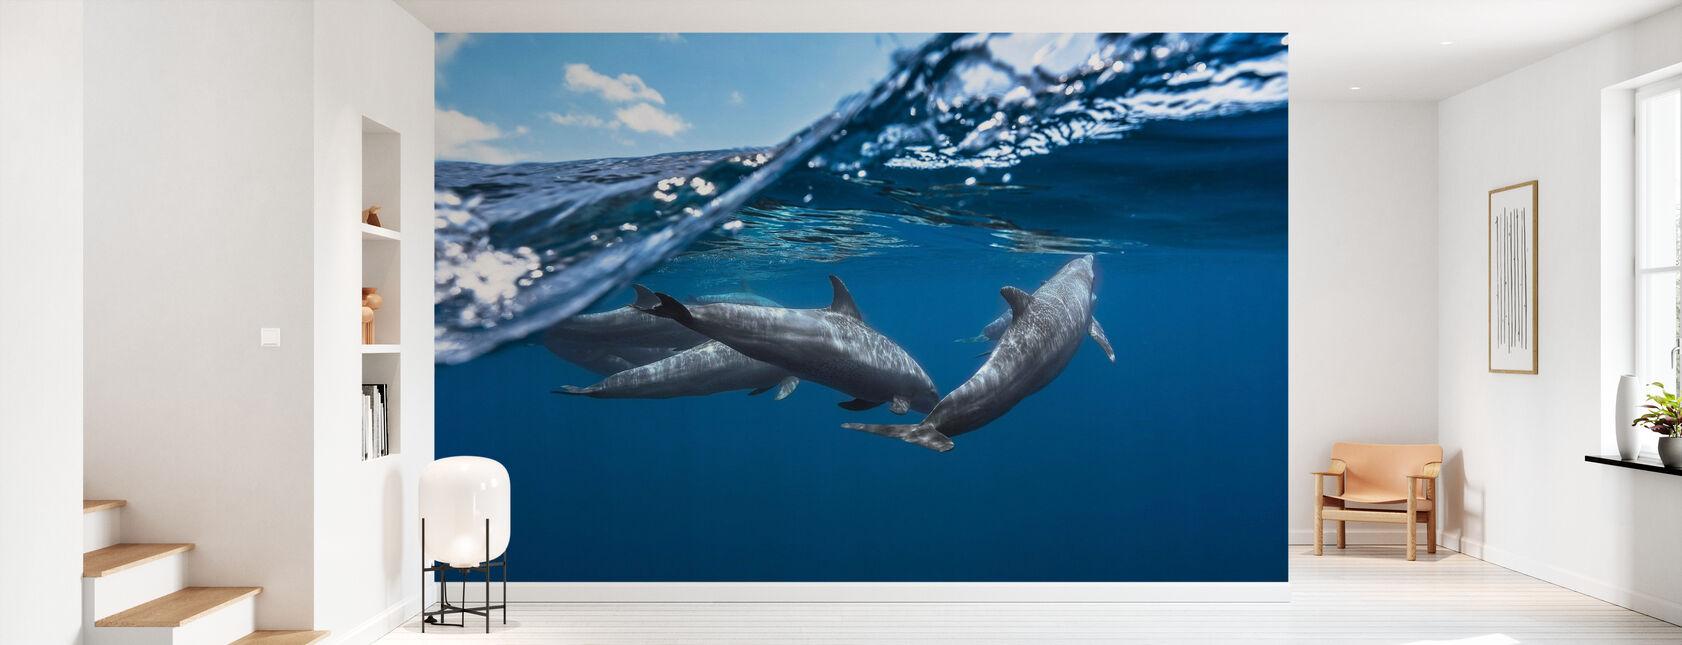 Dolphins - Wallpaper - Hallway